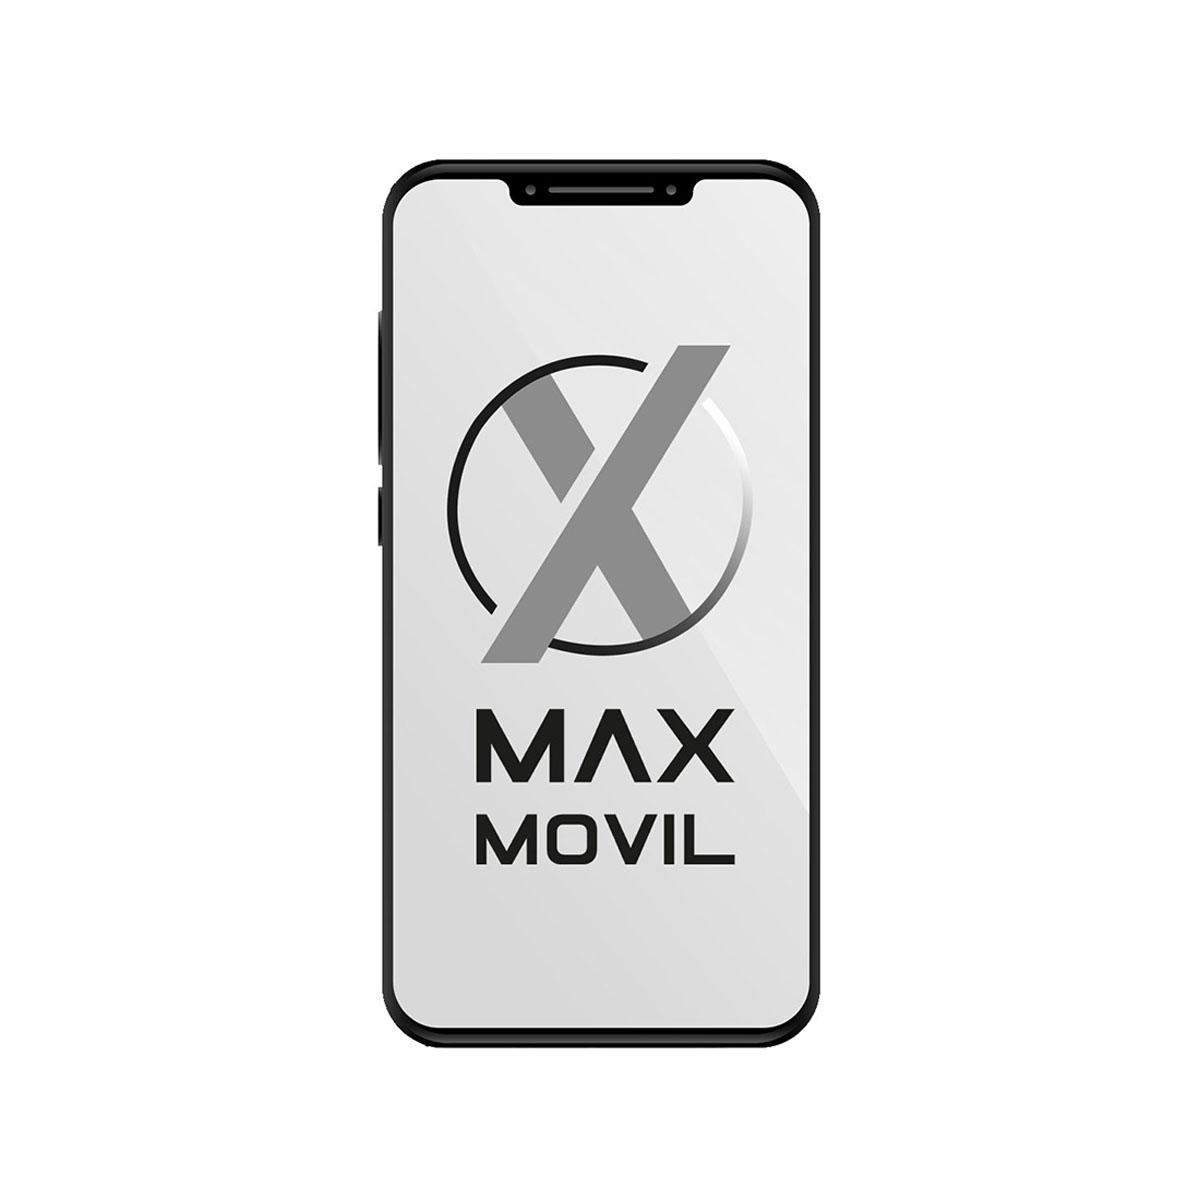 Cargador de viaje de alta calidad para iPhone 3G